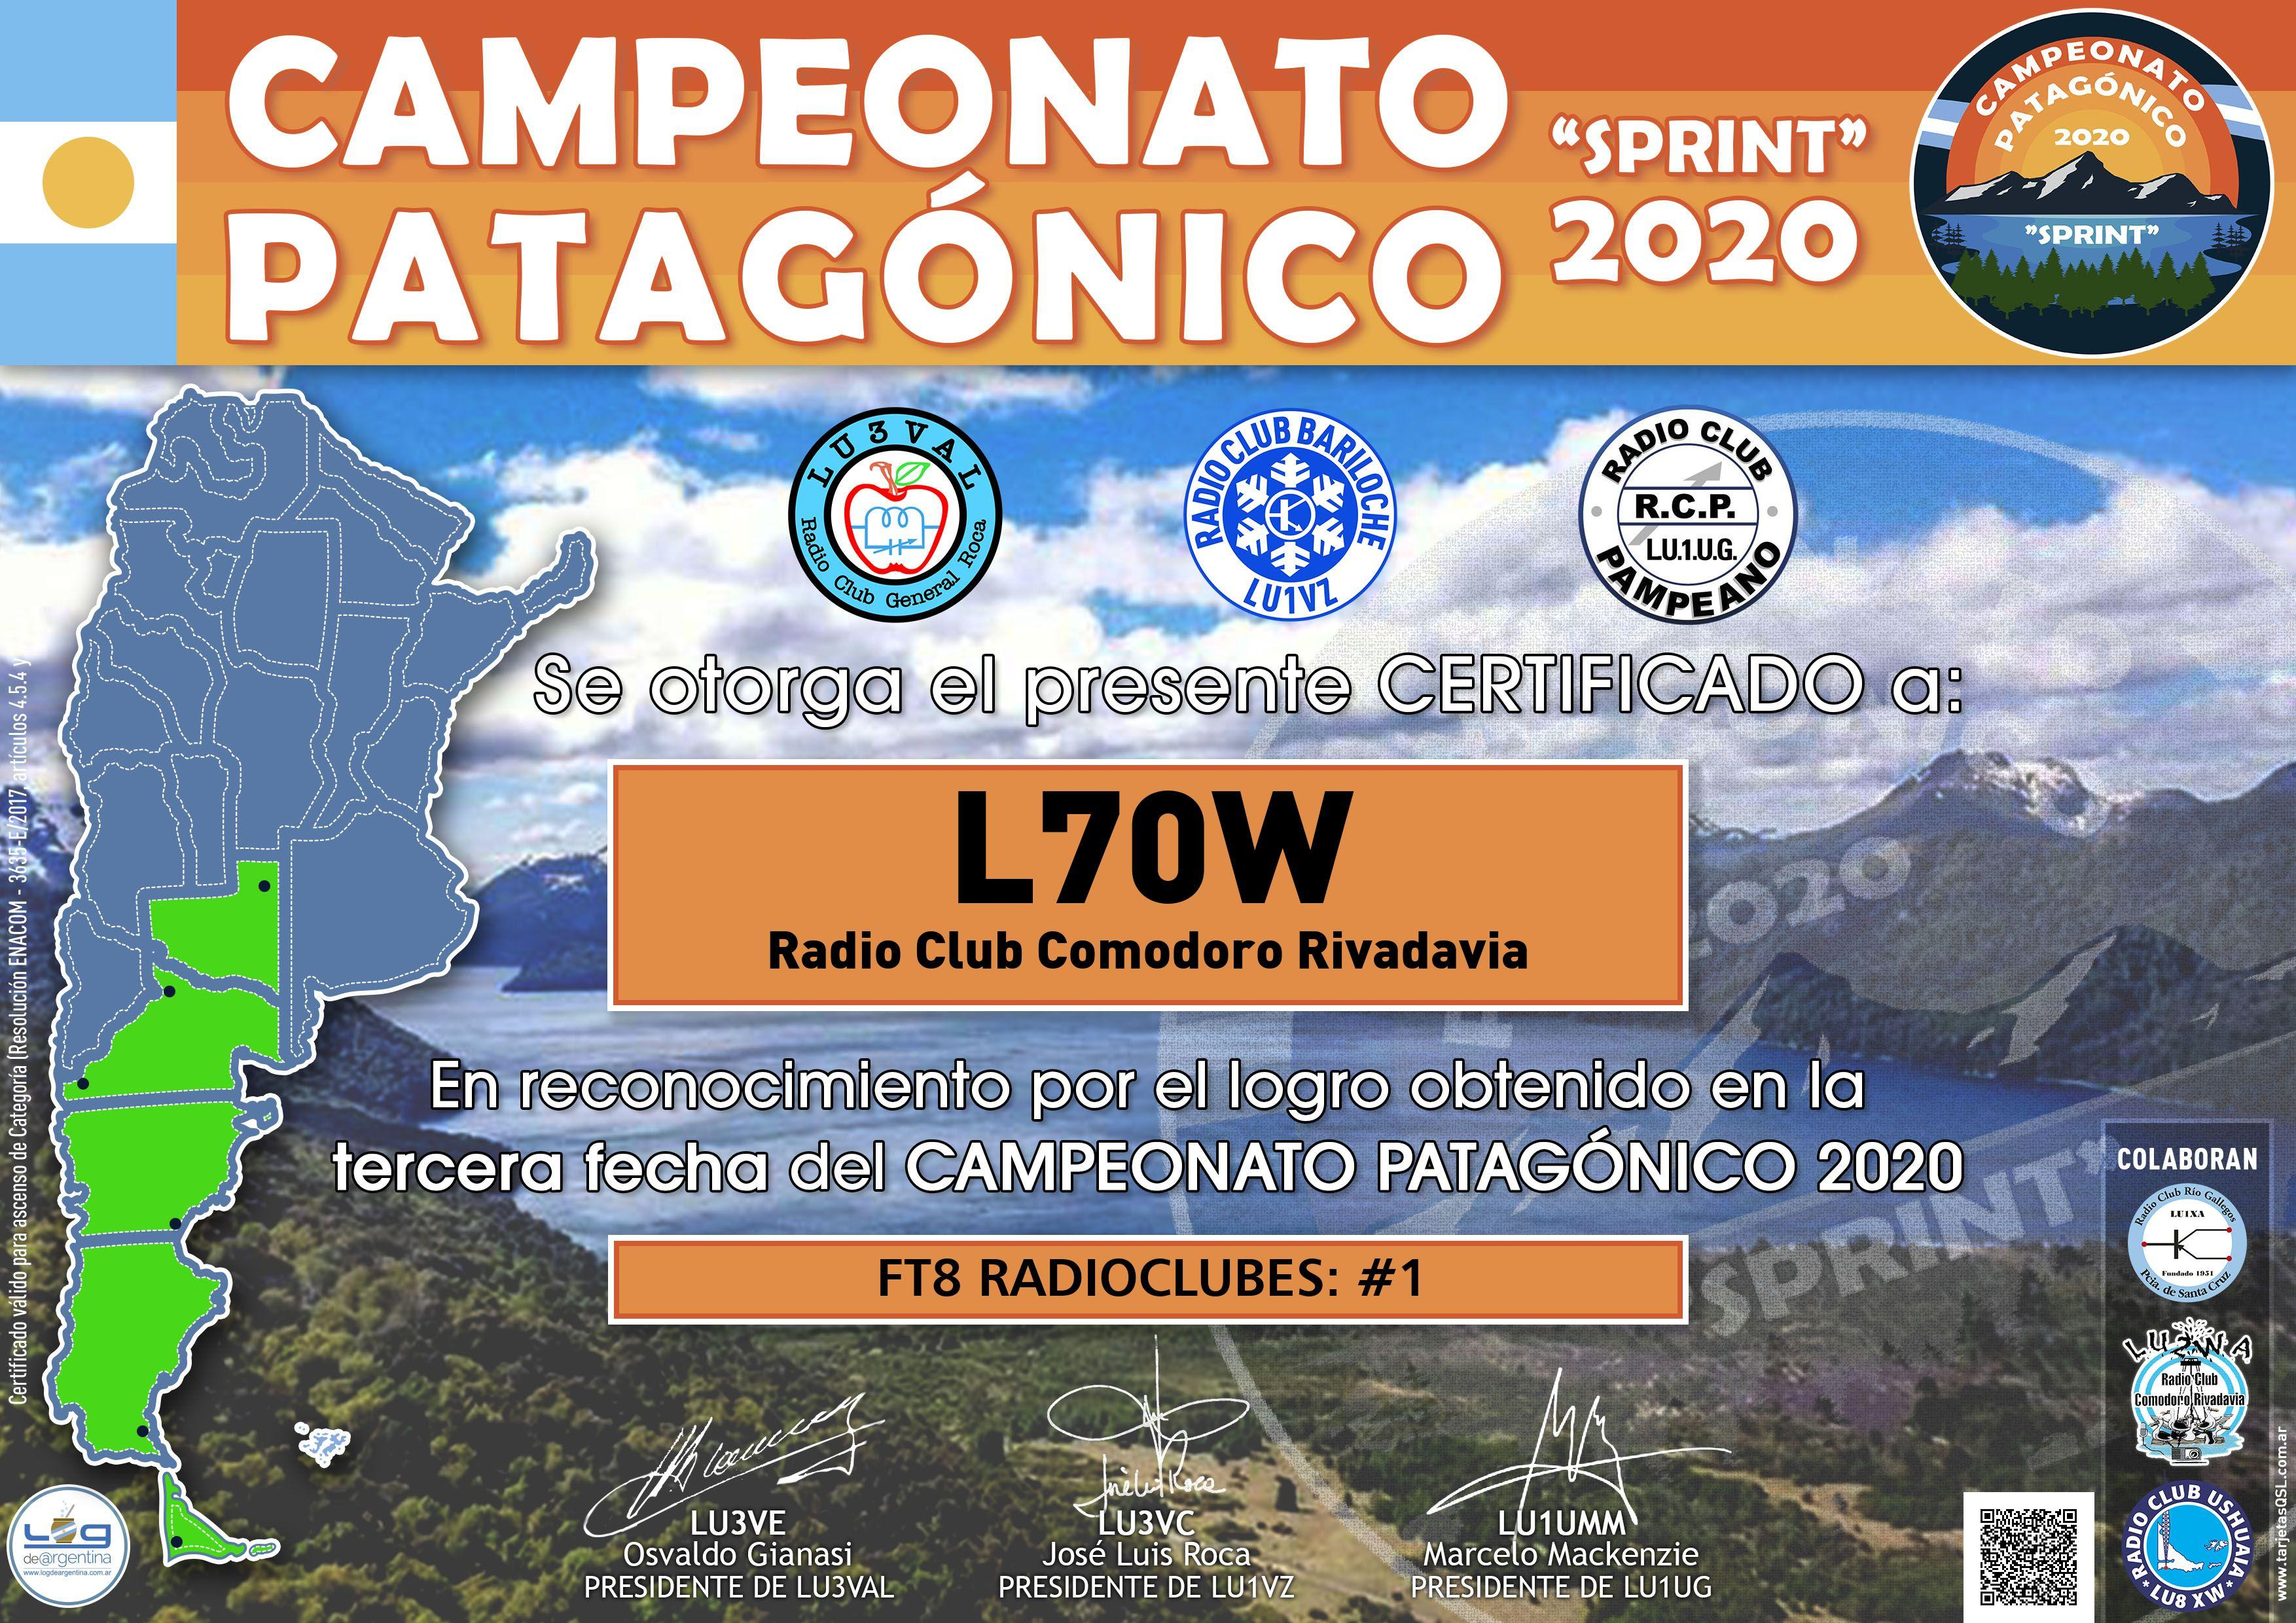 2020 12 19 lu2wa l70w Sprint patagonico 3rafecha ft8 - Resultados 3ra. fecha Campeonato Patagónico 2020